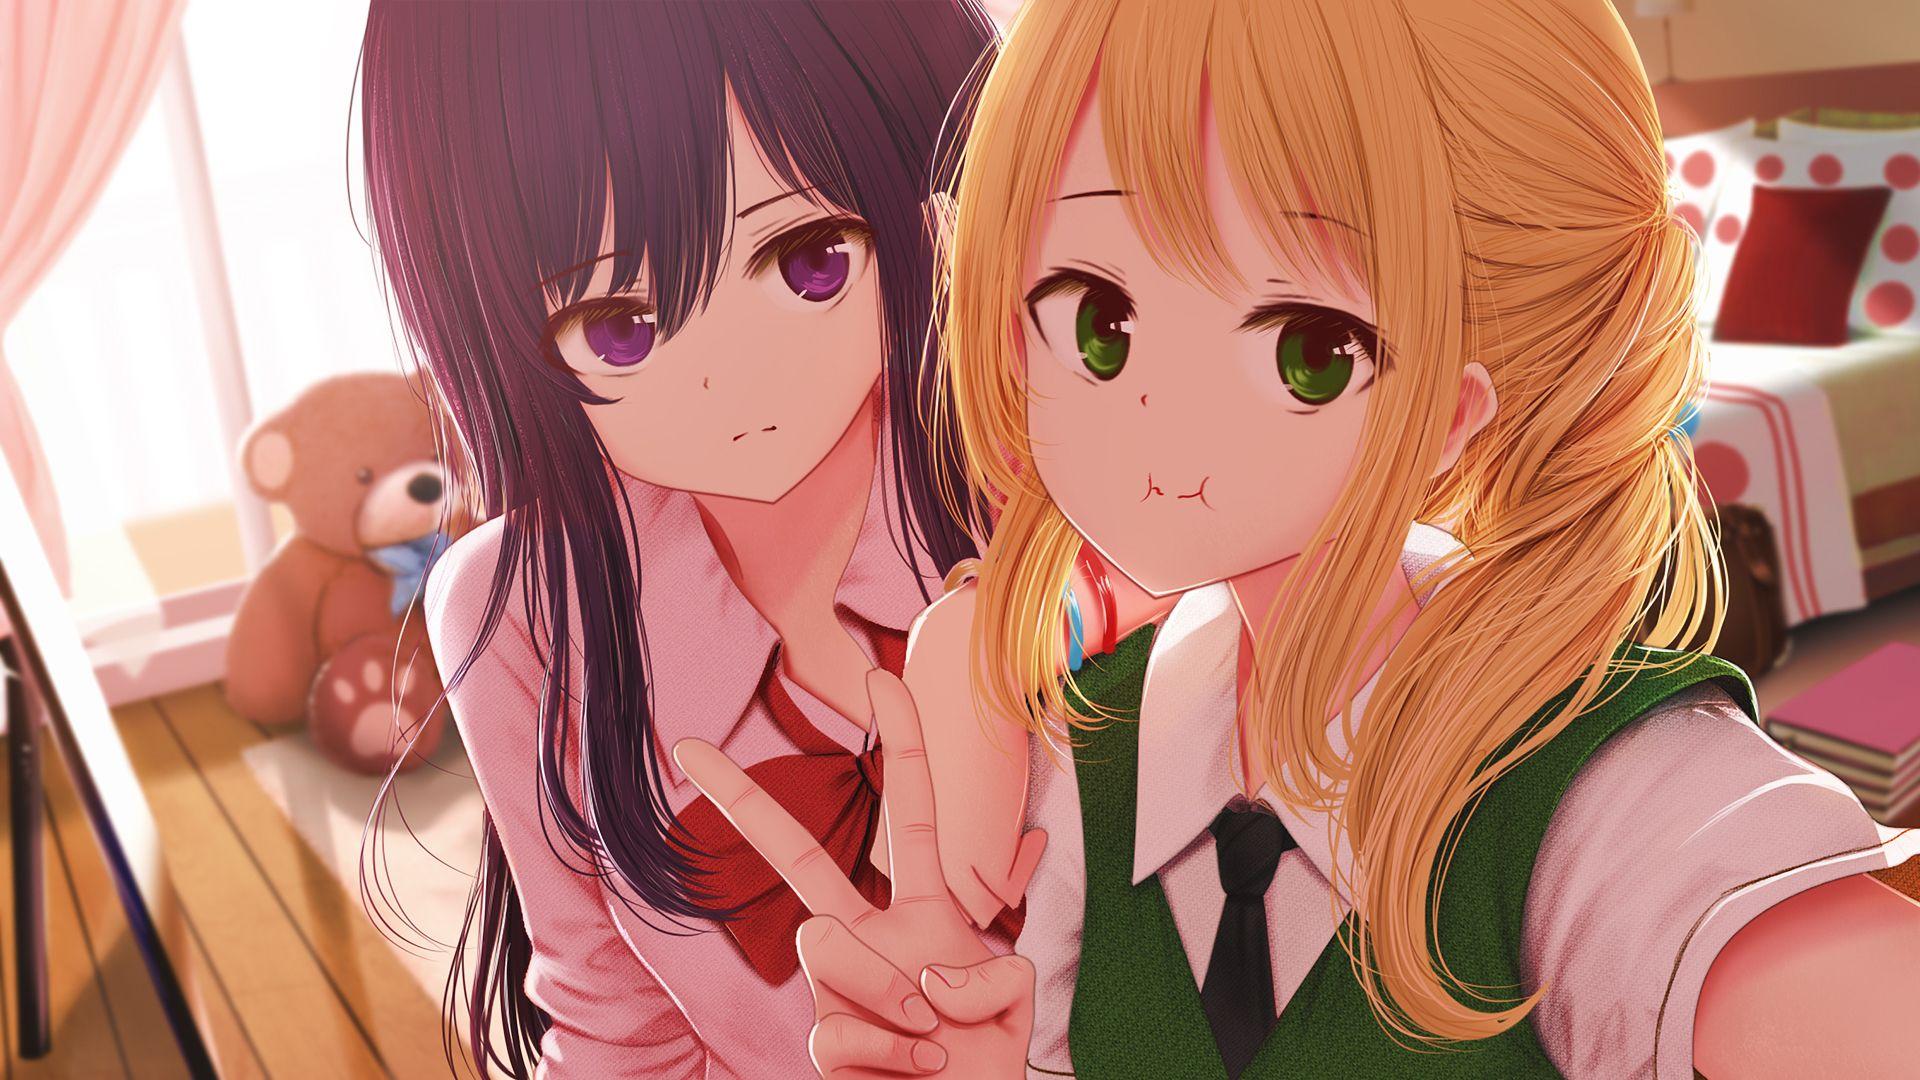 Yzmei Xchange Uniform Artistas Anime 1080p